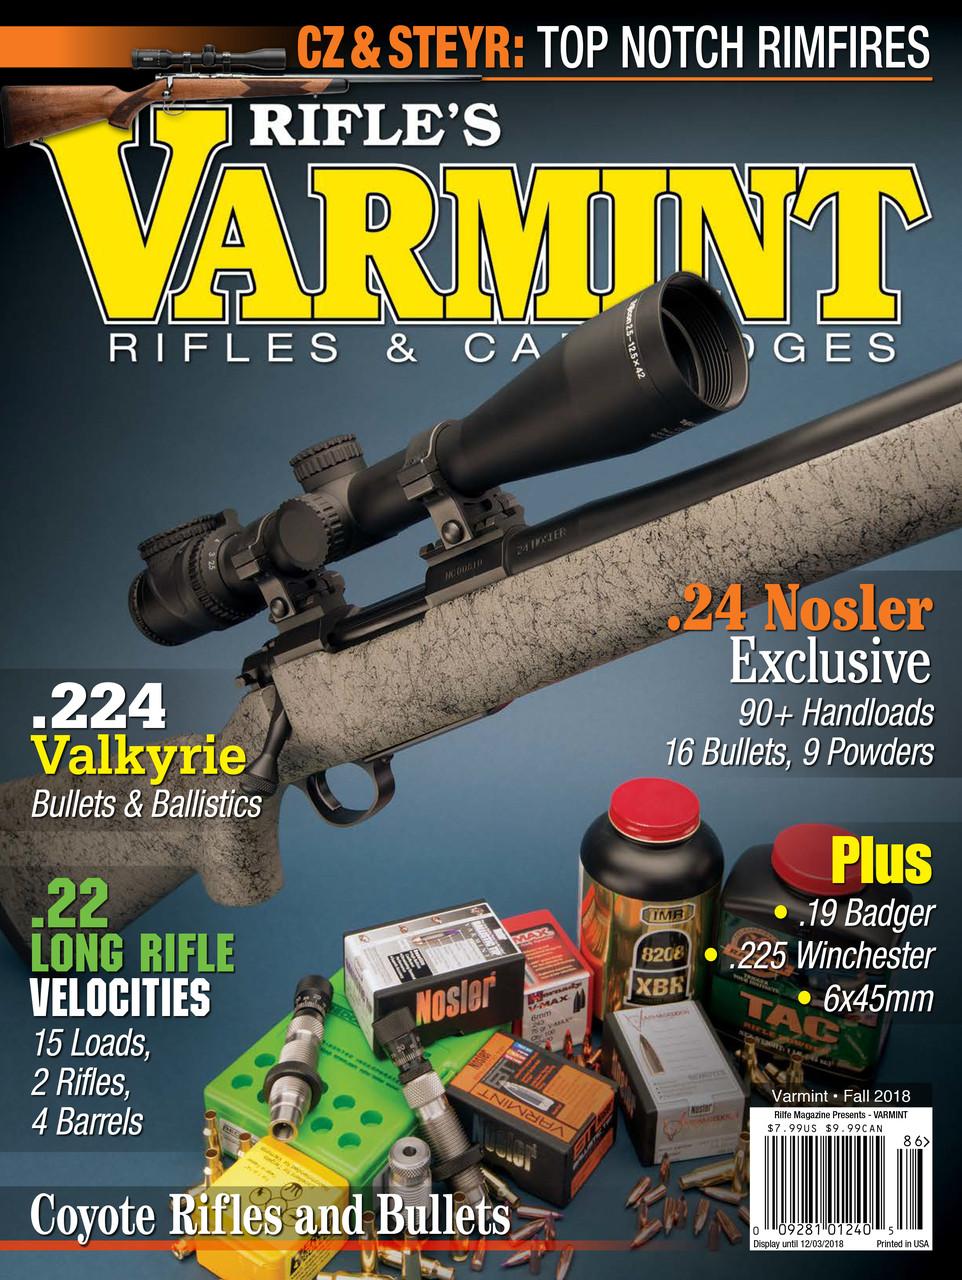 Fall 2018 Varmint Rifles & Cartridges